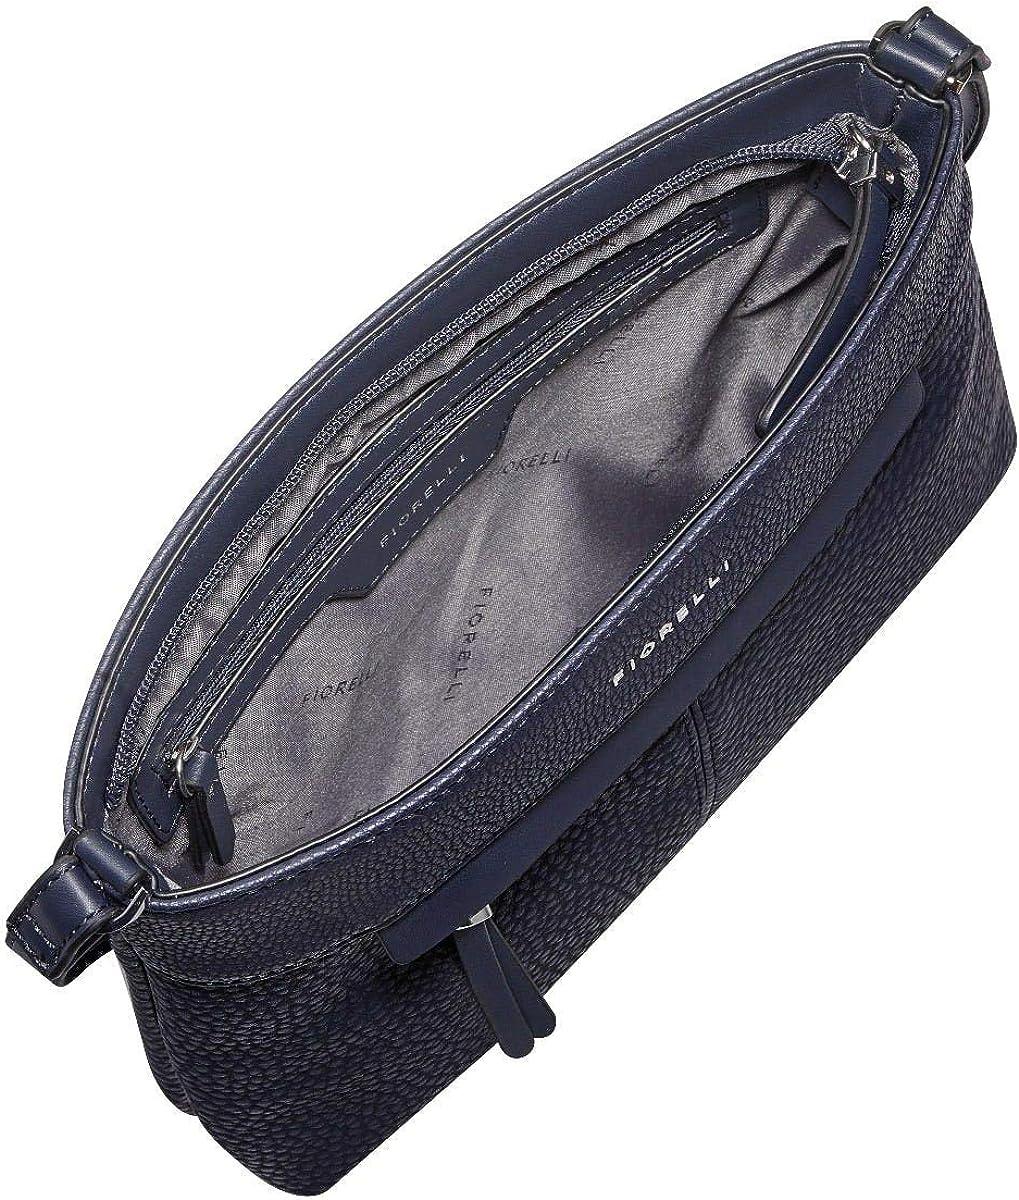 Fiorelli Womens Chelsea Crossbody Bag